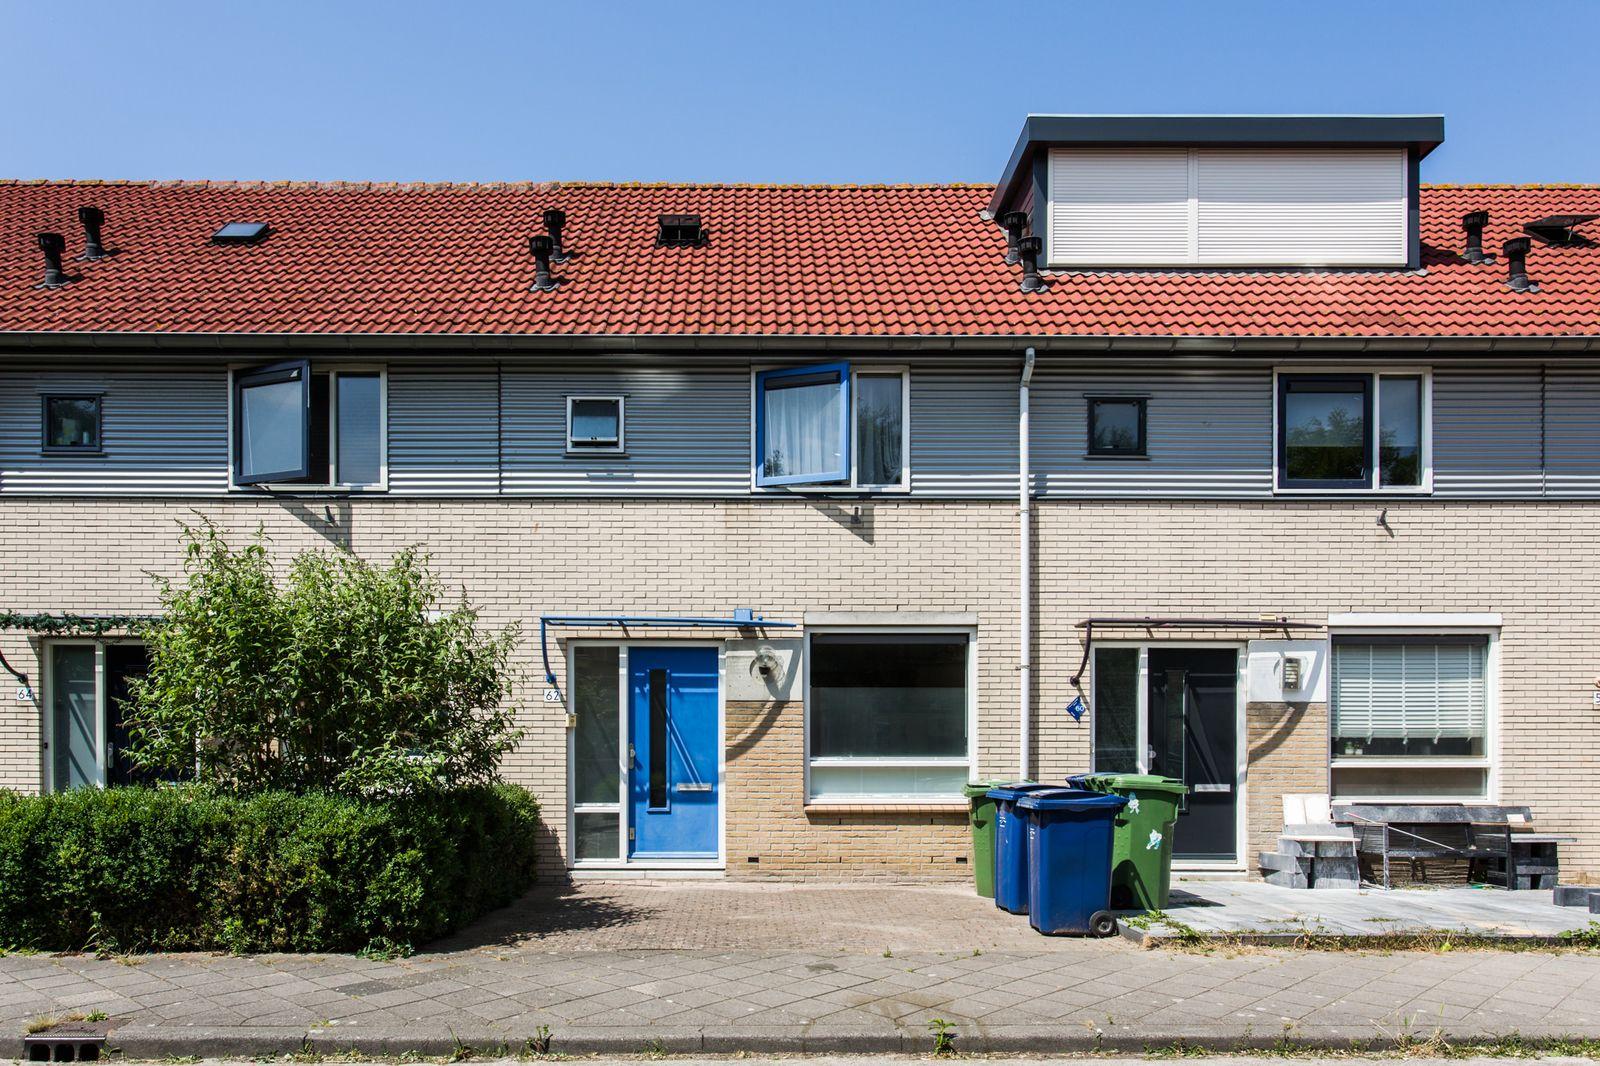 Sambastraat 62, Almere